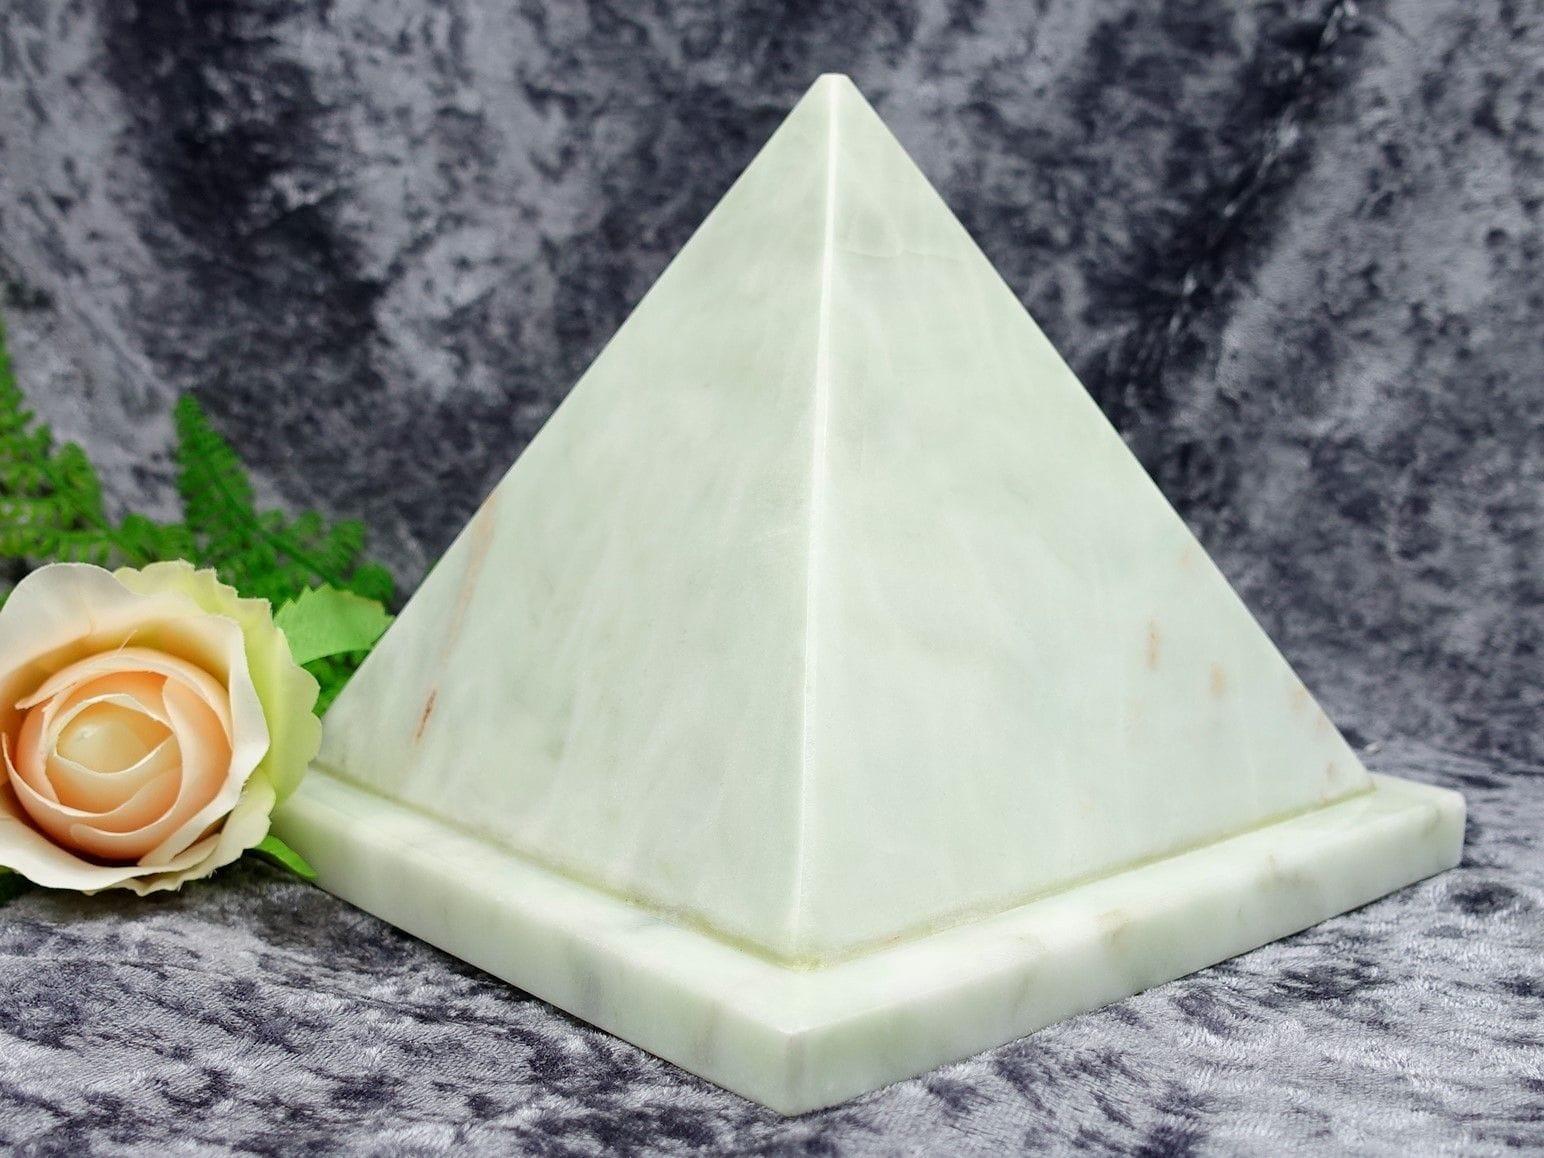 Pyramid Urn jade small 02